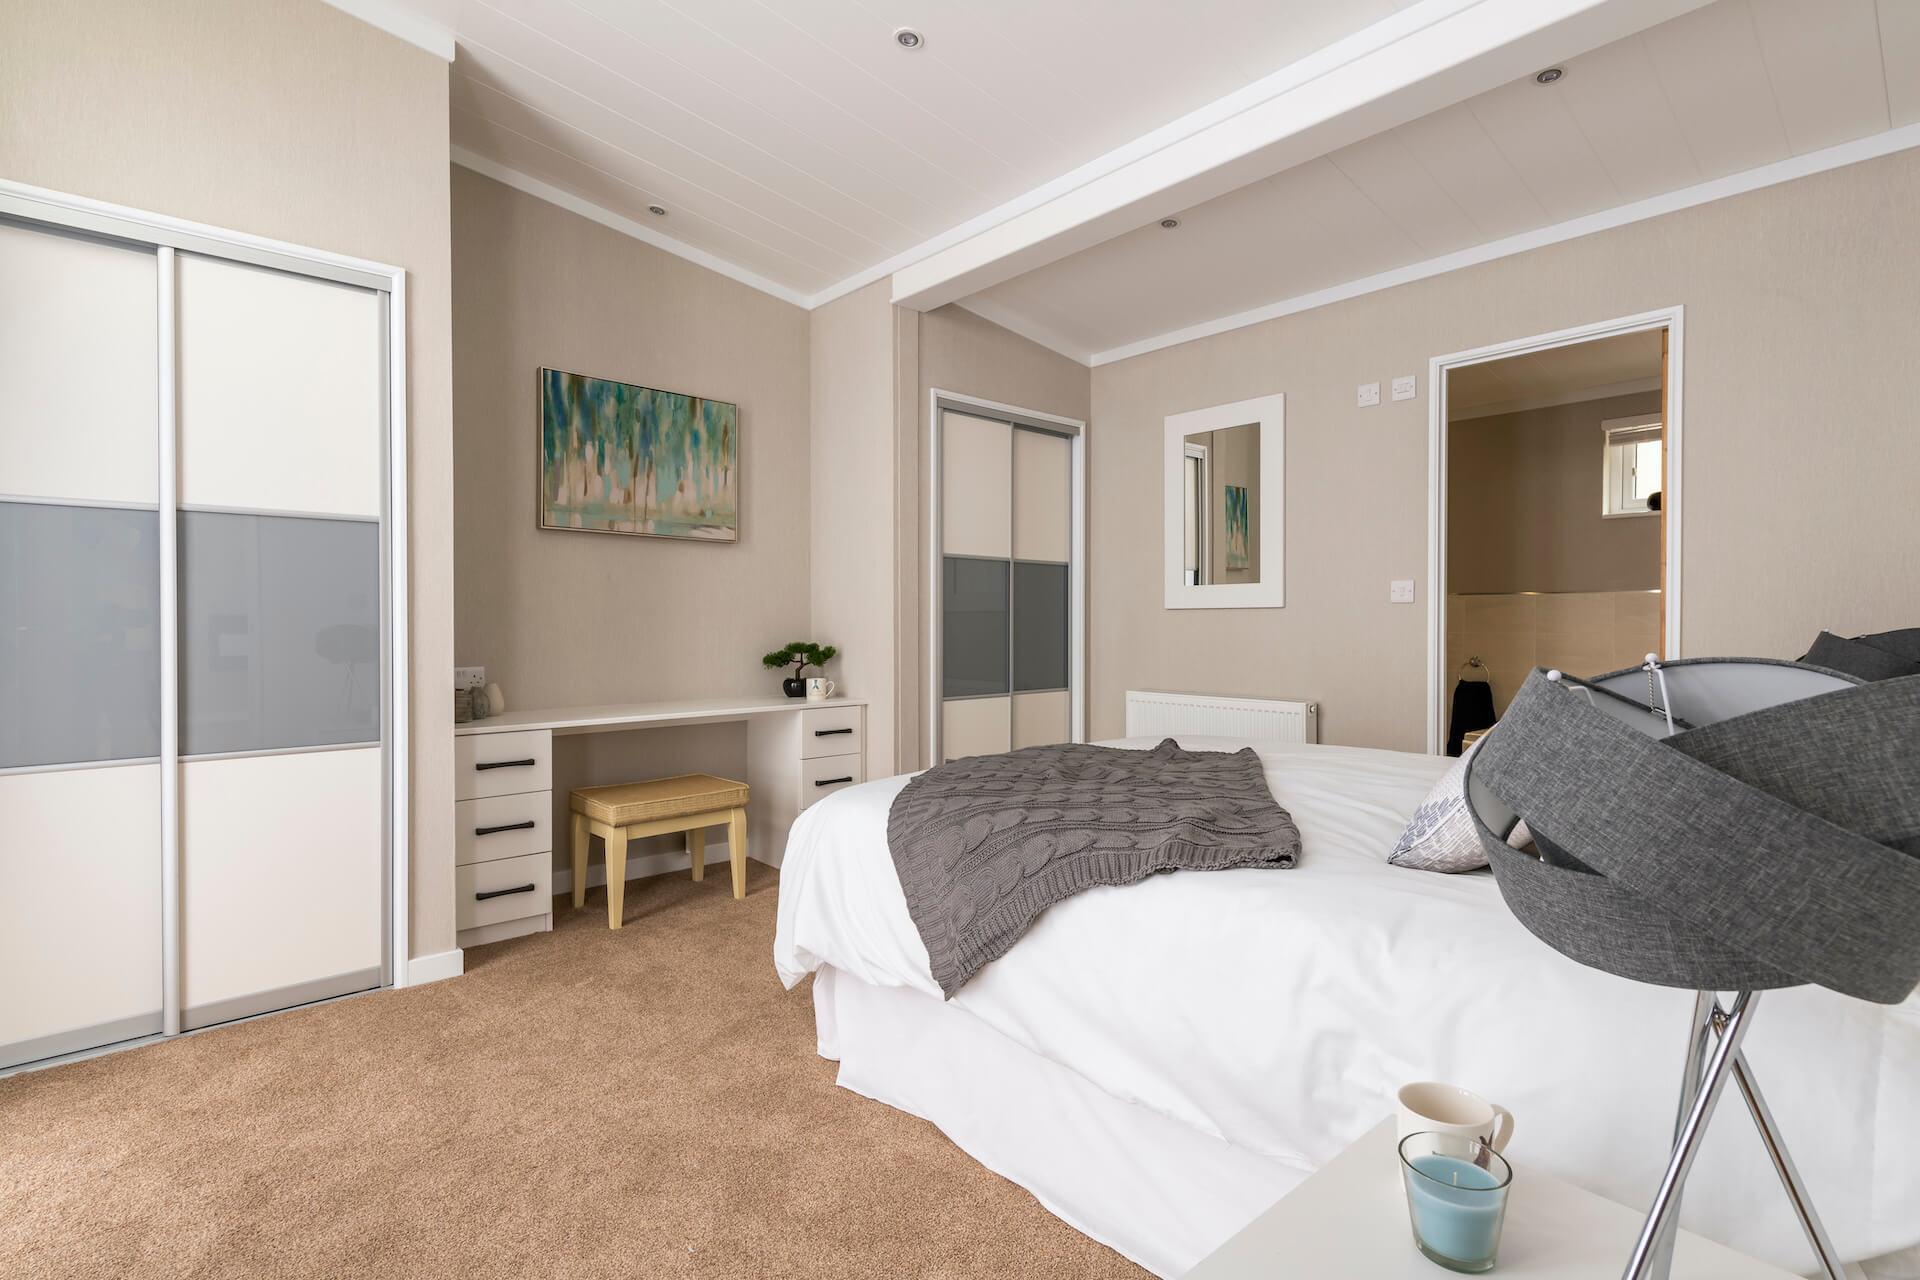 Omar-Atrium-Monopitch-Master-Bedroom-v2